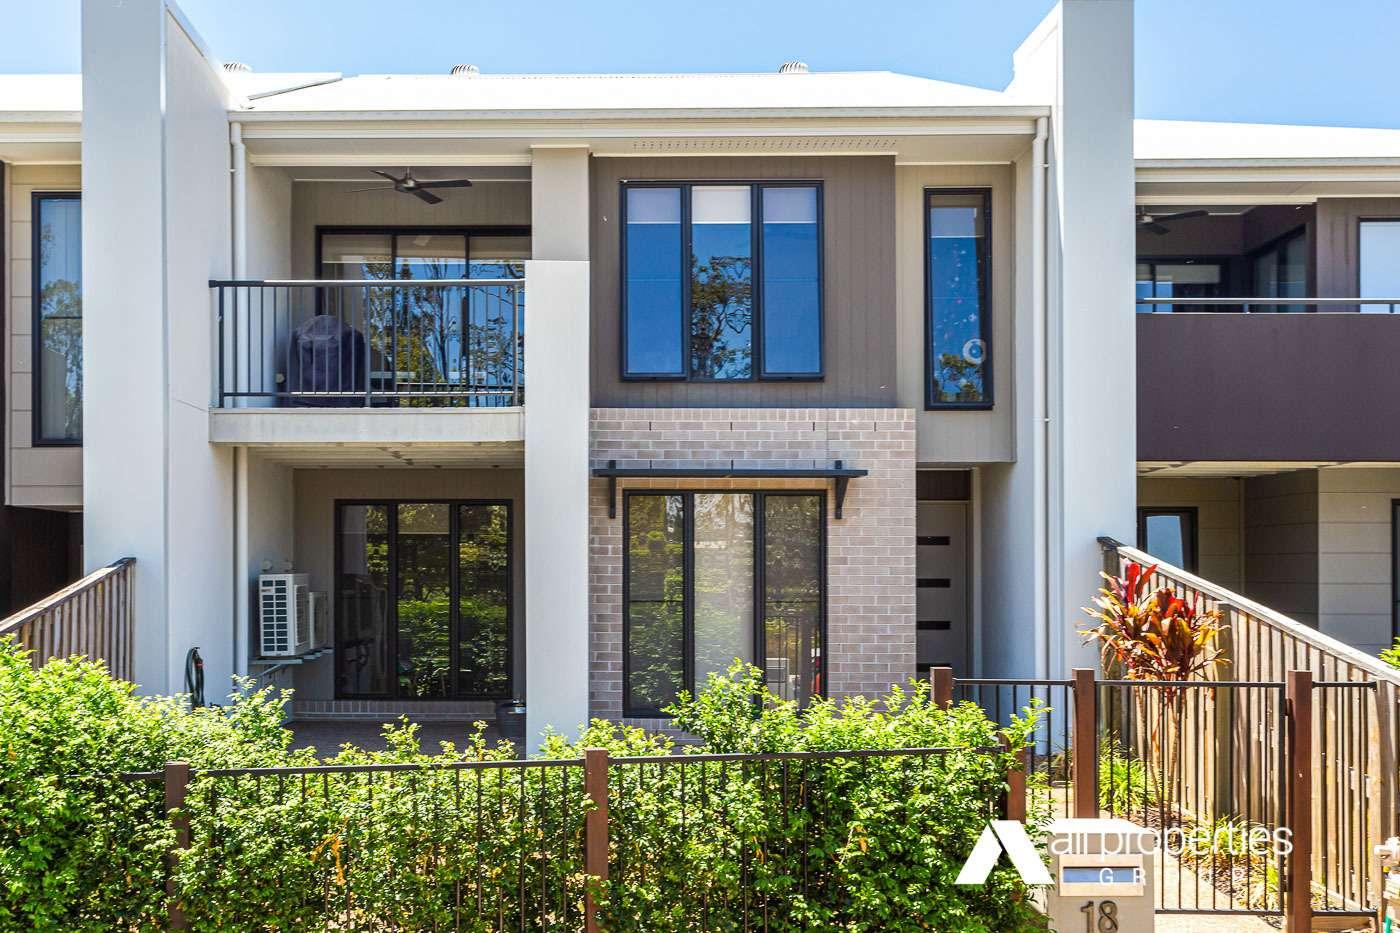 Main view of Homely house listing, 18 Garragul Drive, Yarrabilba, QLD 4207